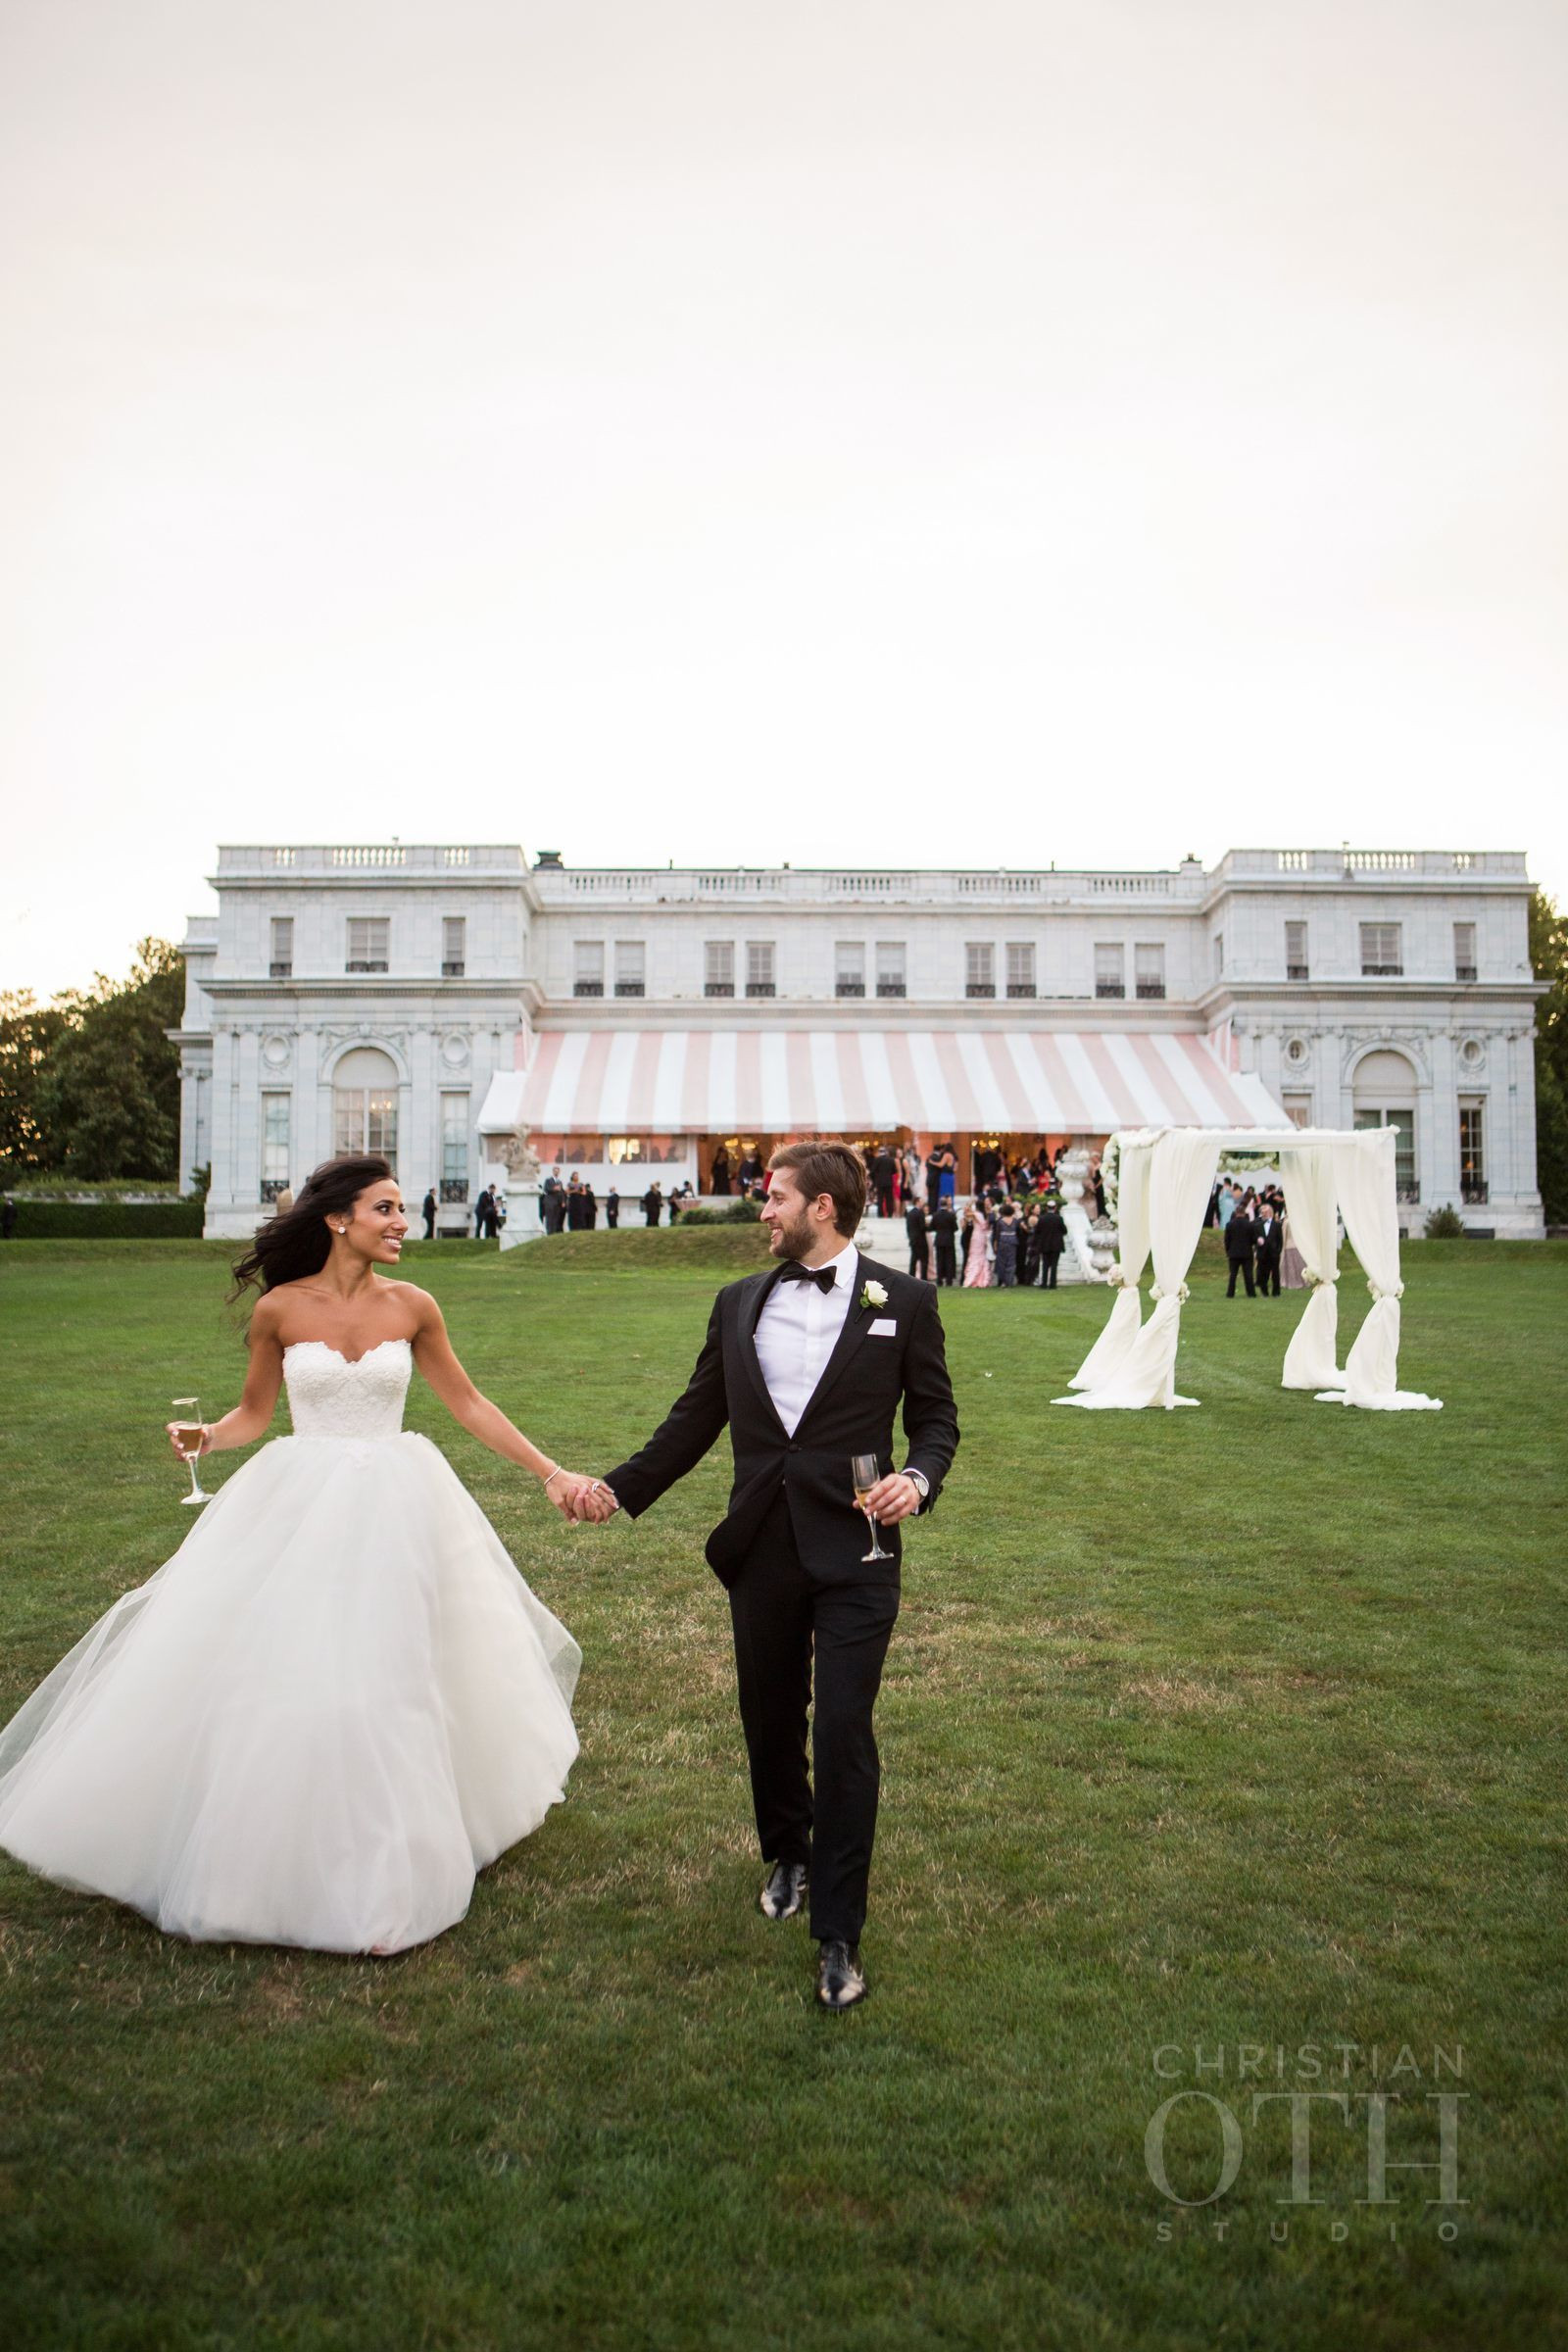 Vintage frenchinspired wedding with glamorous details mansion